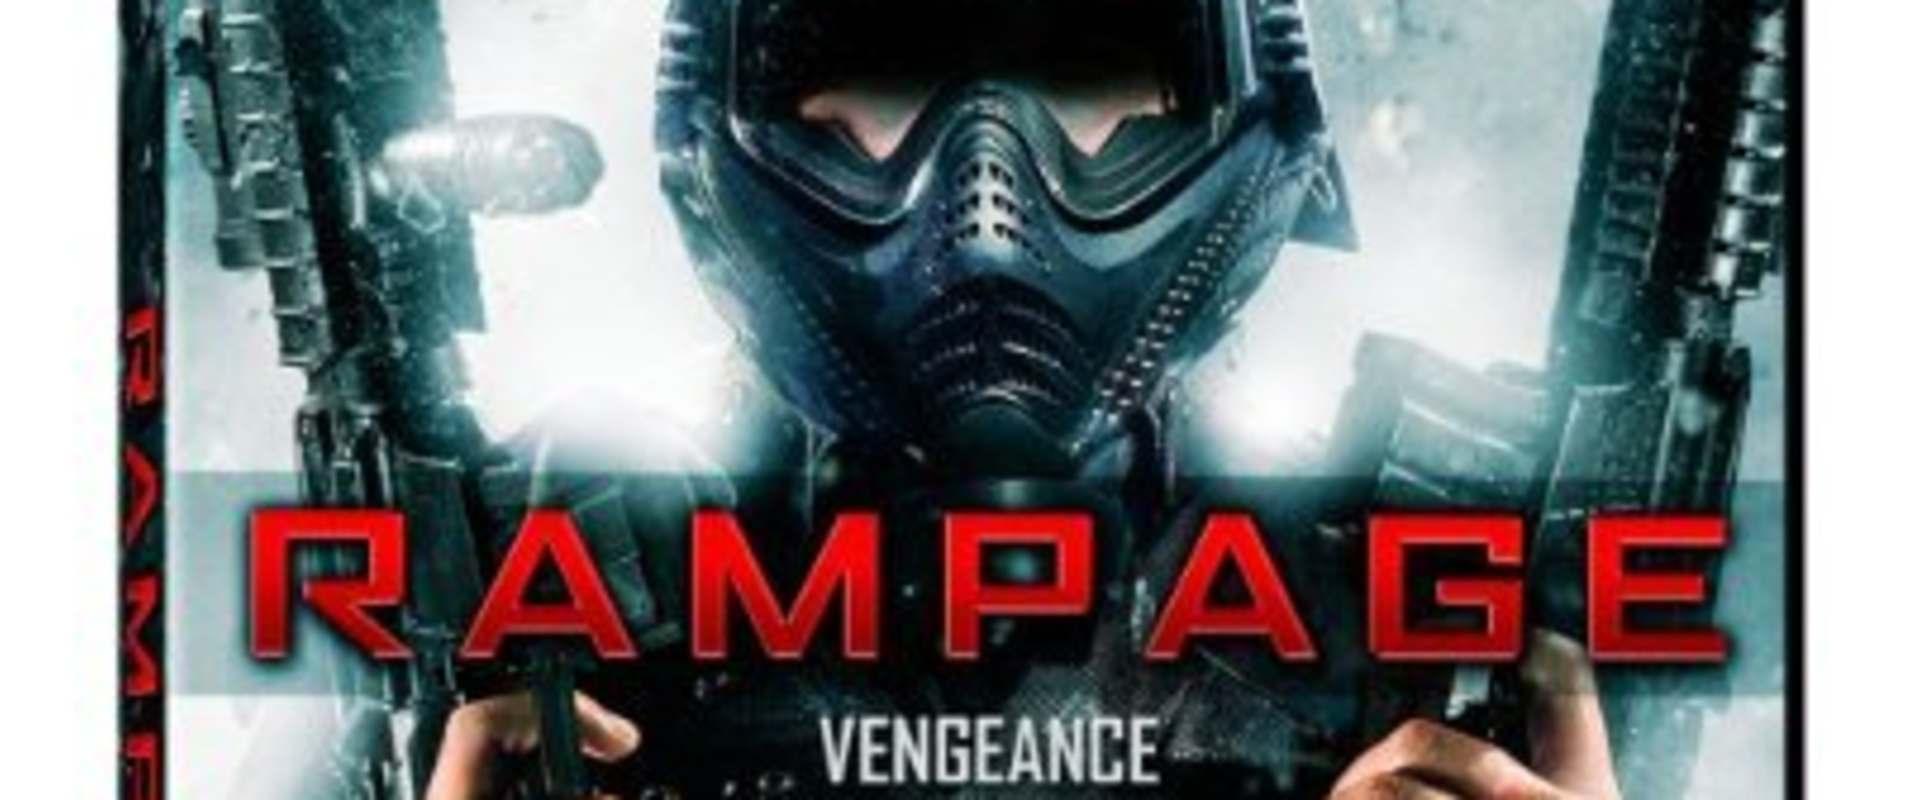 Watch Rampage On Netflix Today Netflixmovies Com